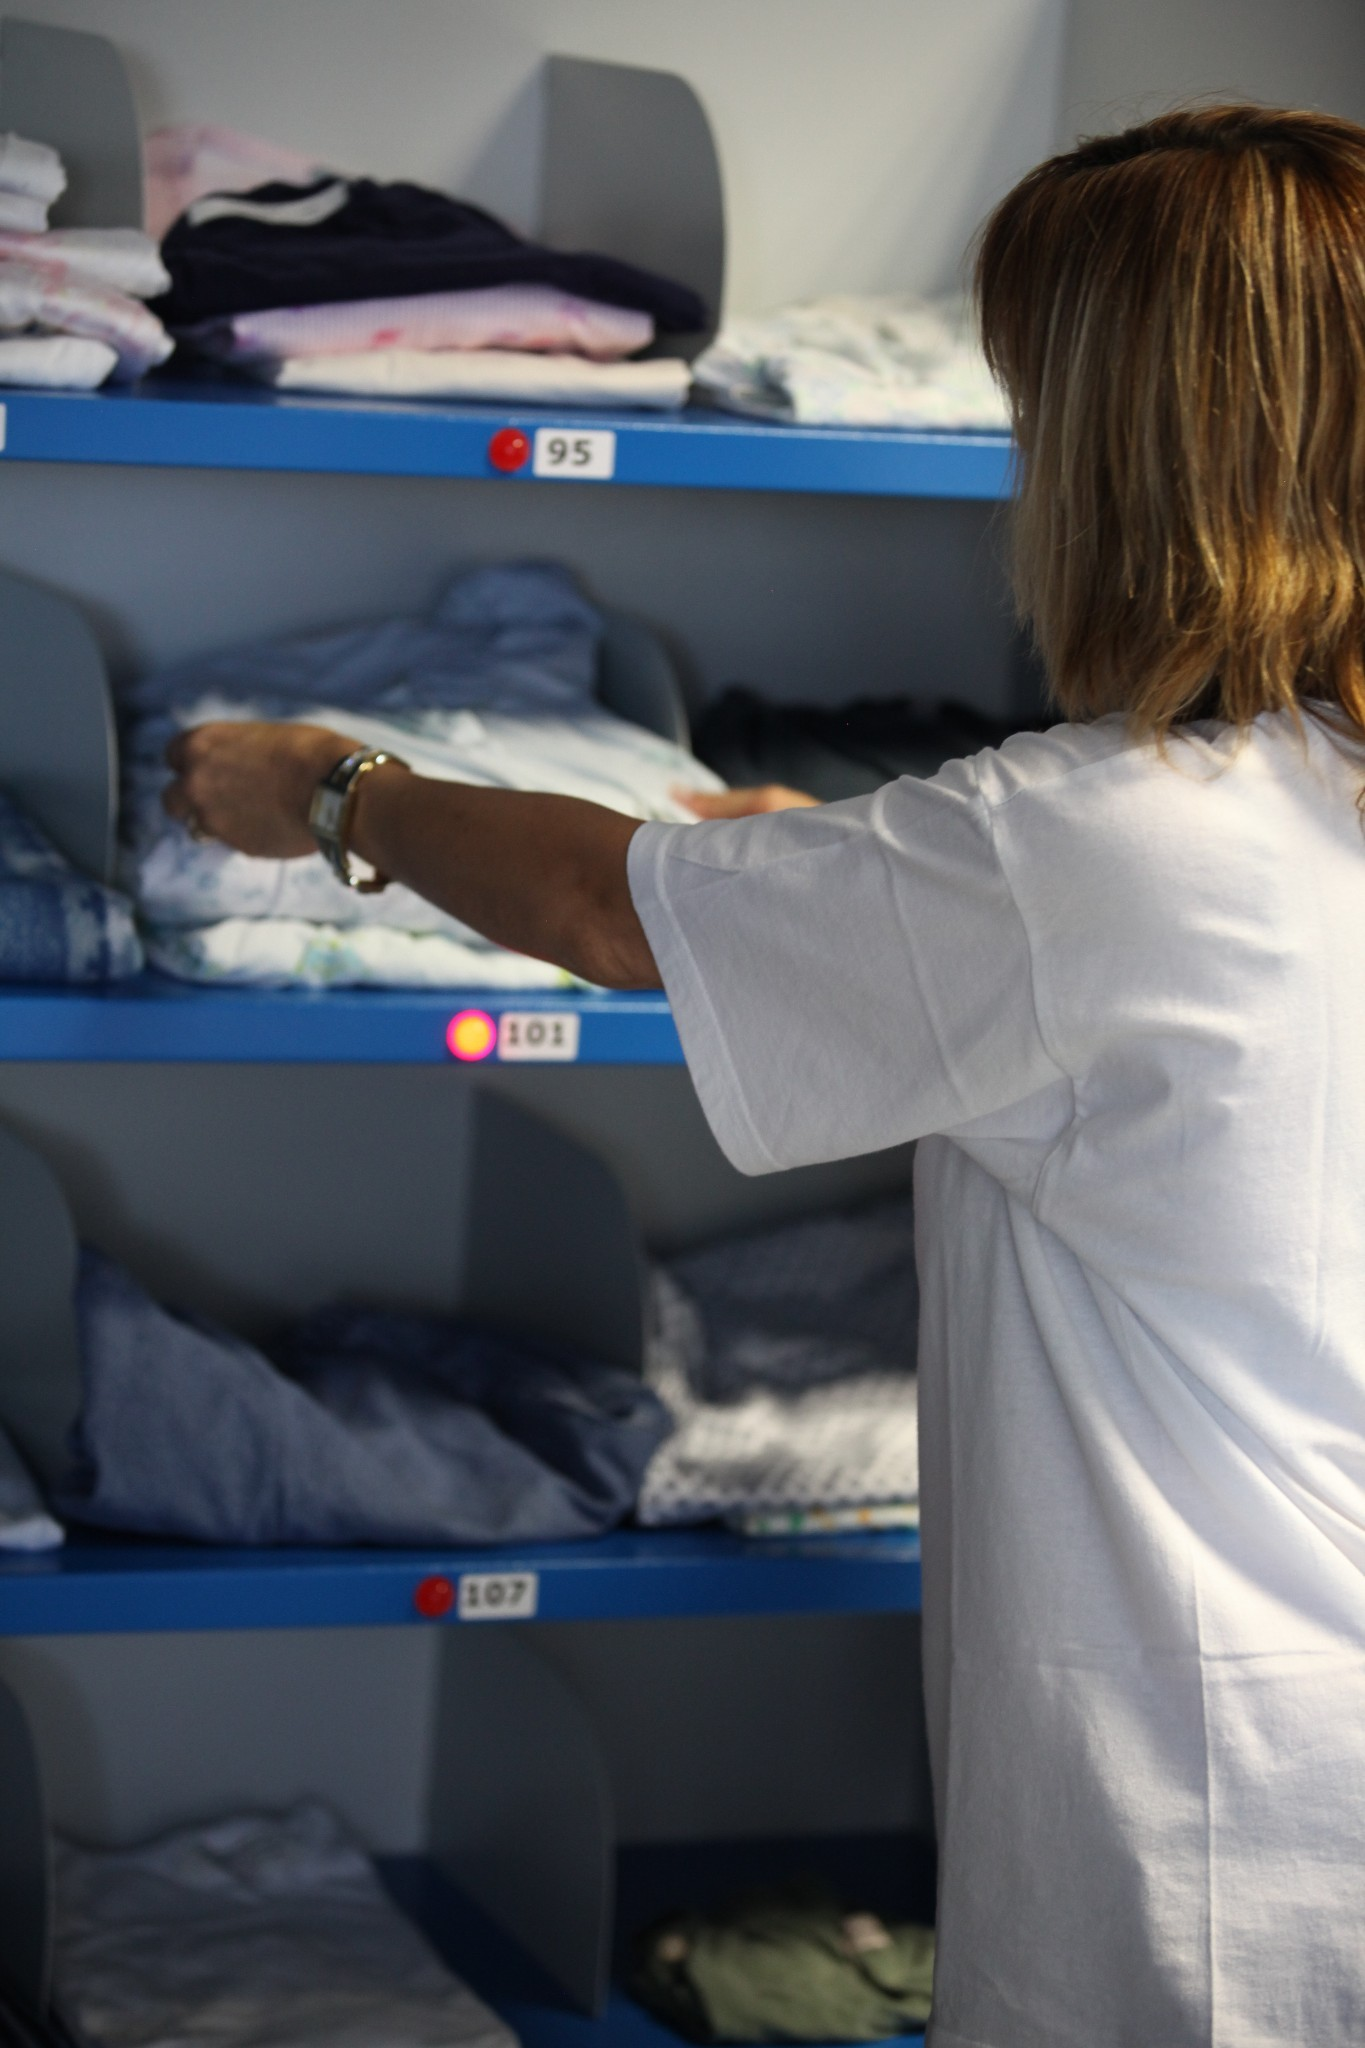 004-blanchisserie-industrielle-hospitaliere